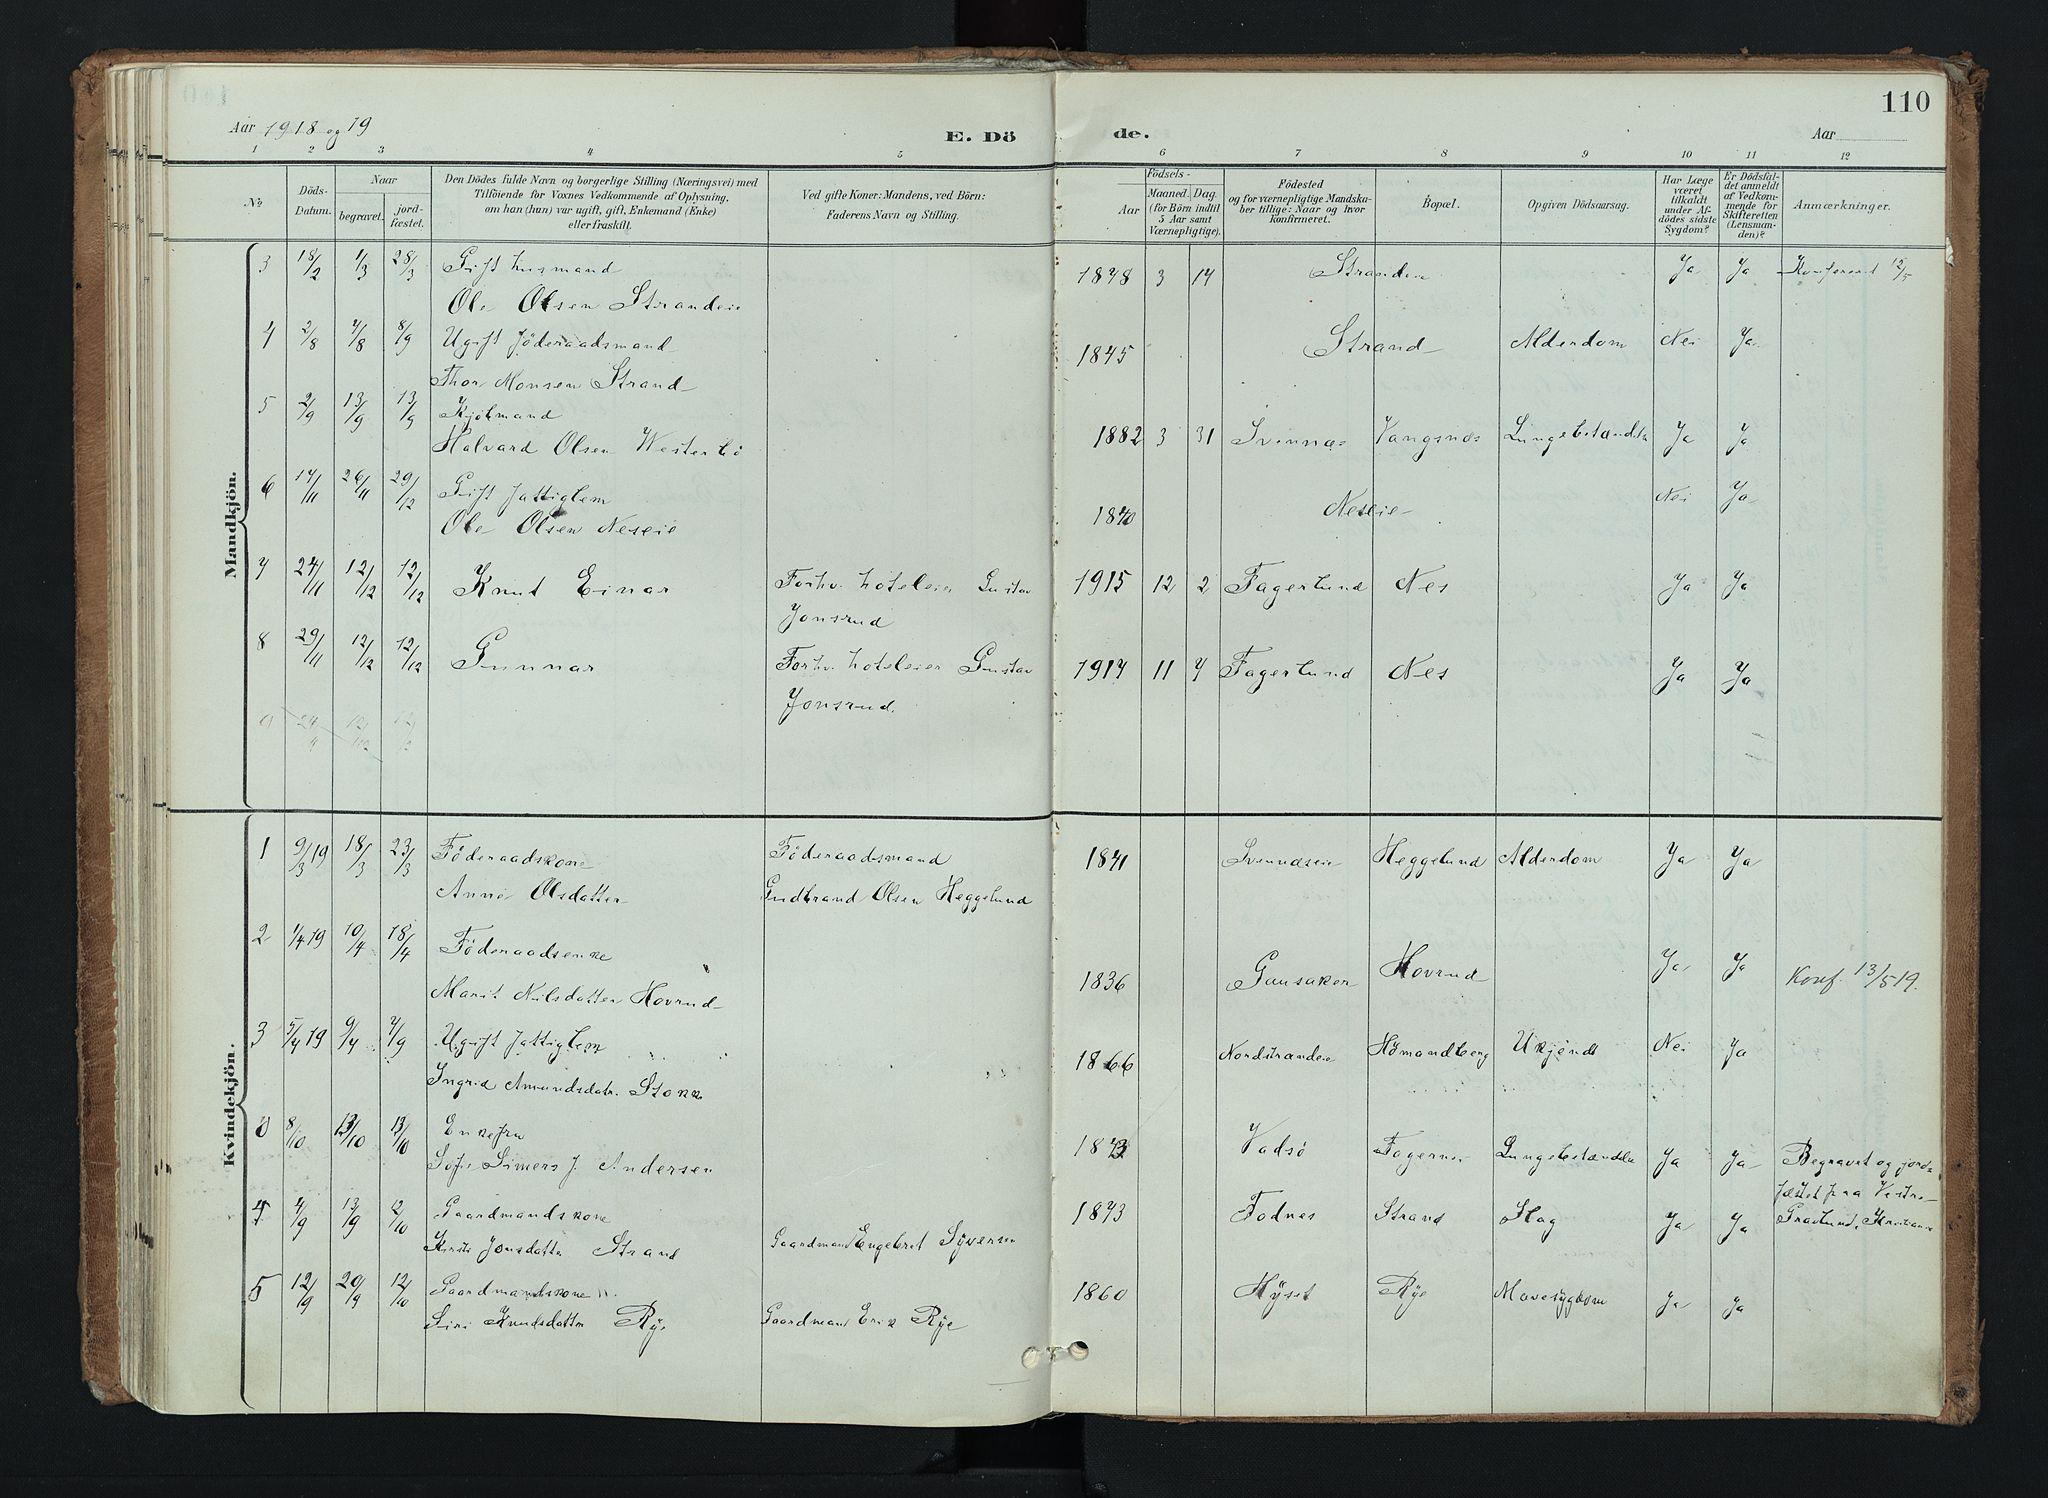 SAH, Nord-Aurdal prestekontor, Ministerialbok nr. 16, 1897-1925, s. 110